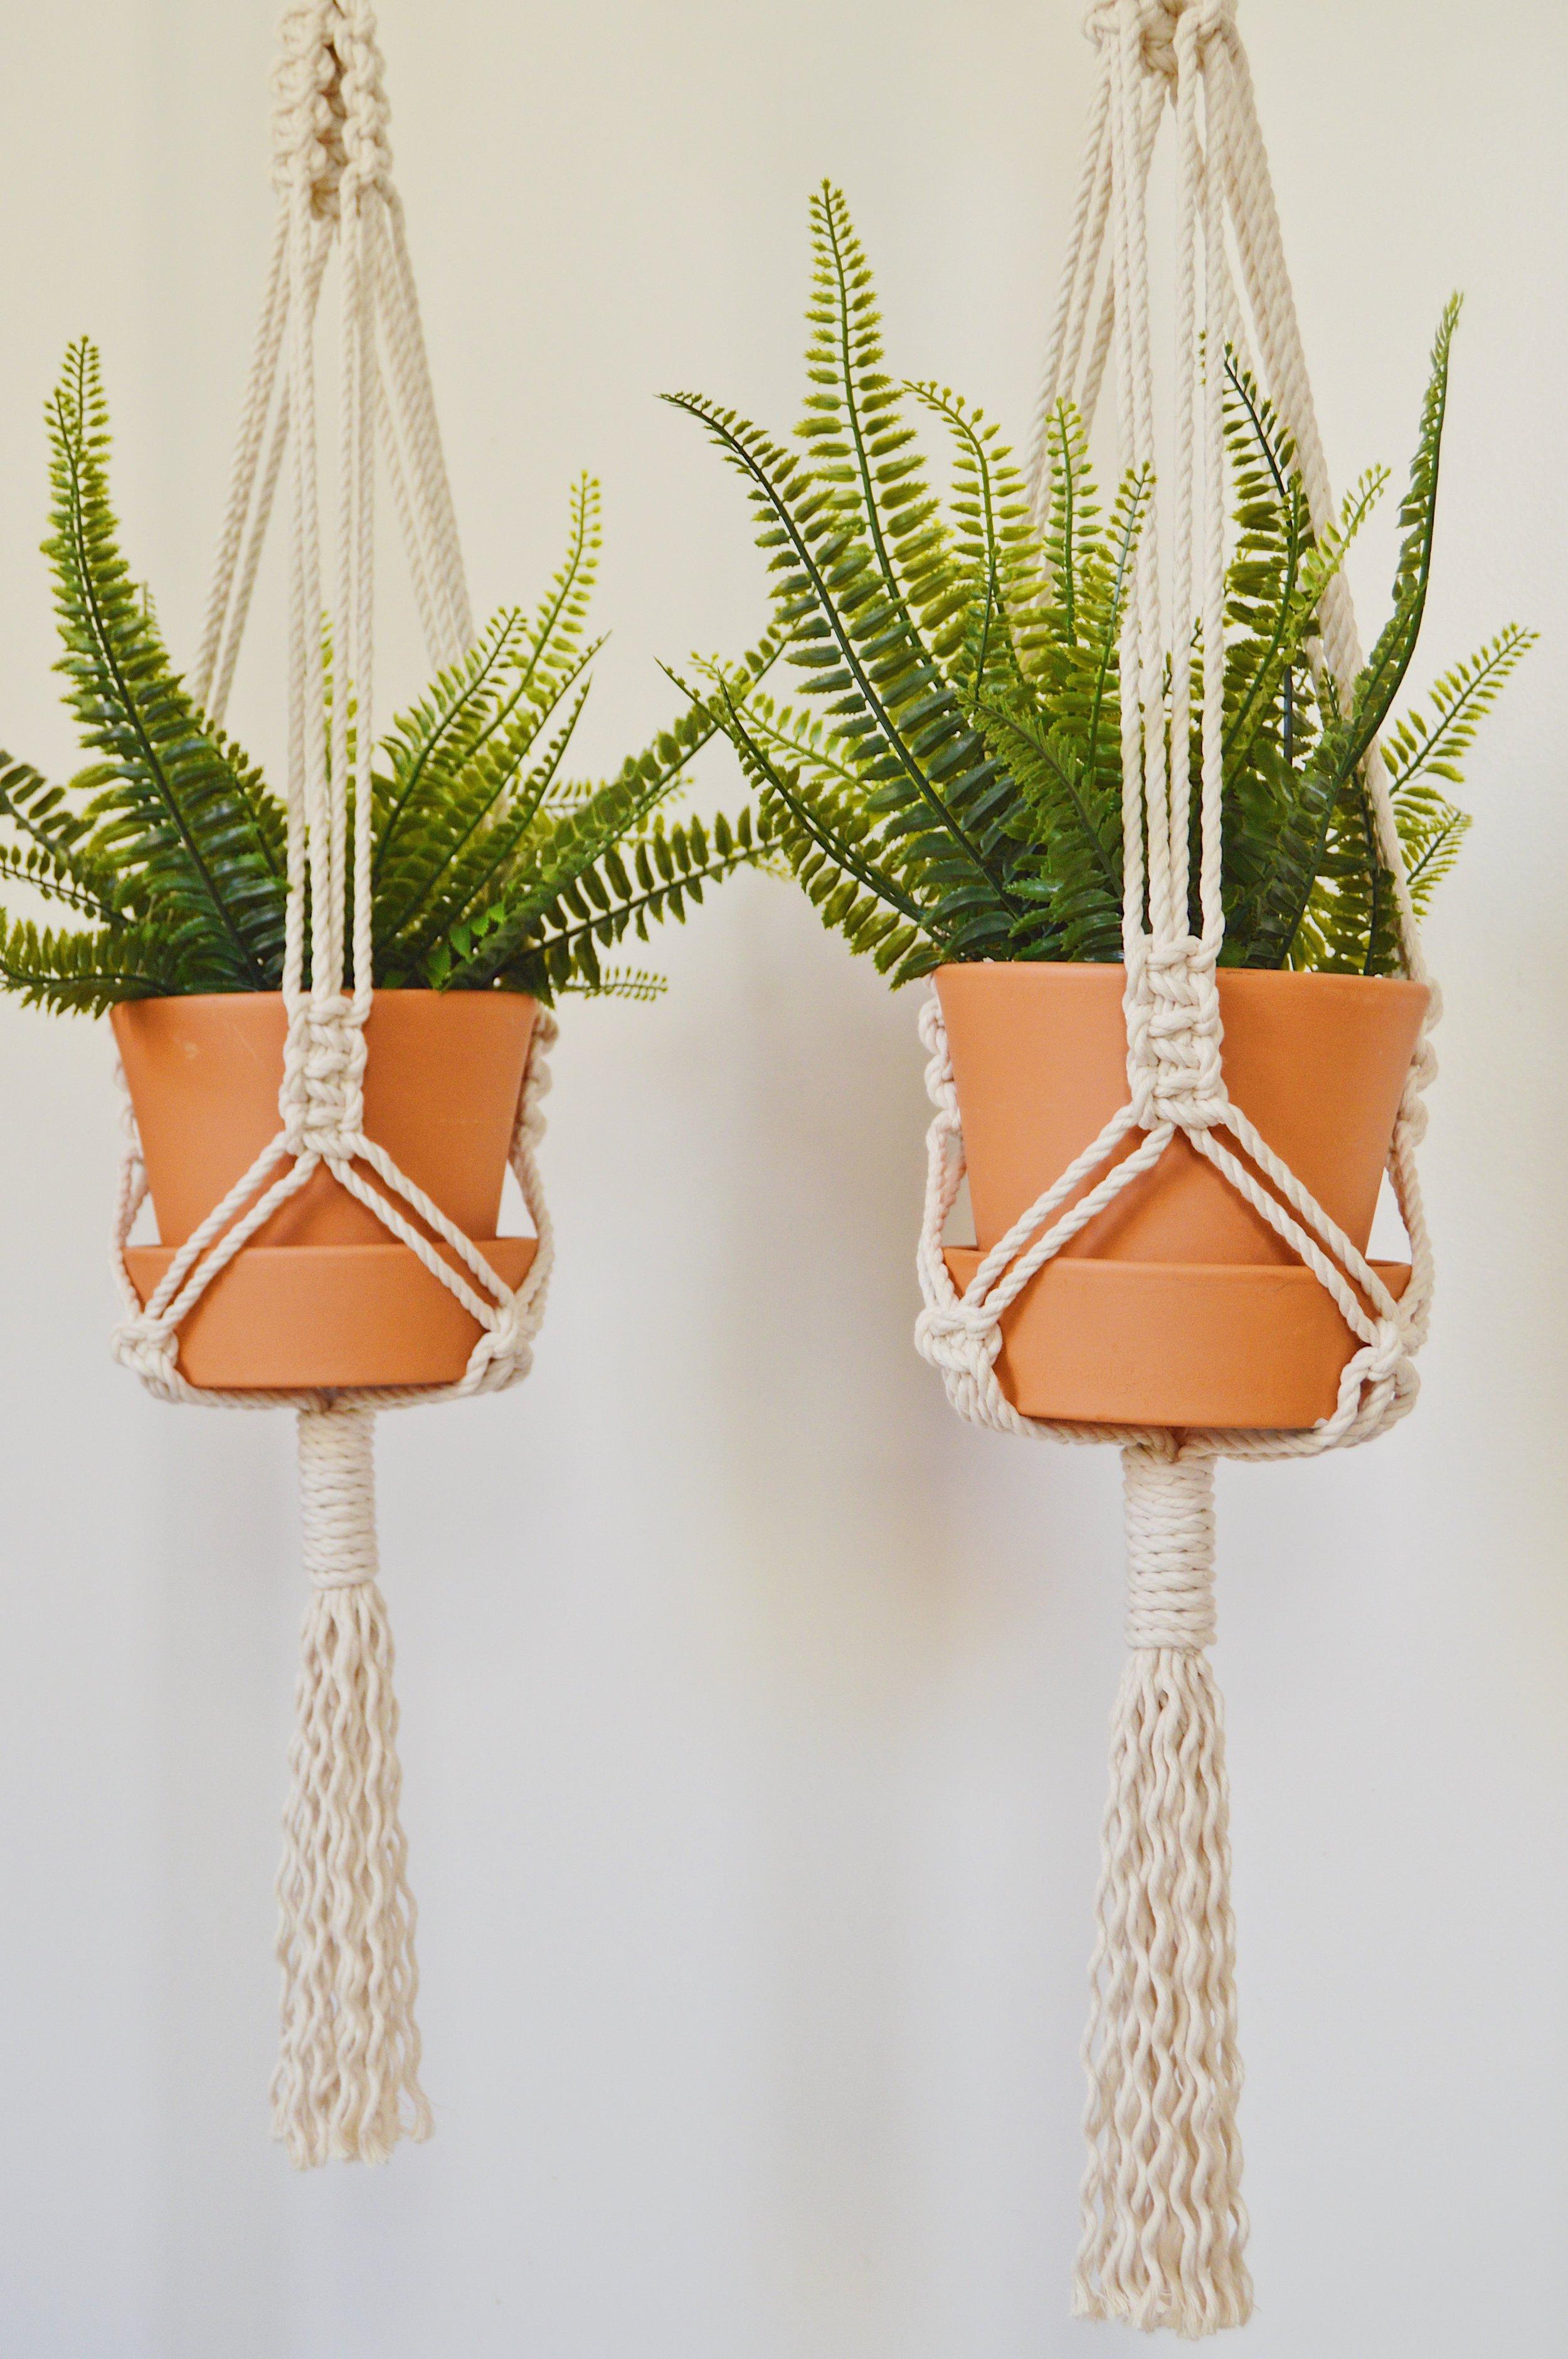 Planthanger3.jpg